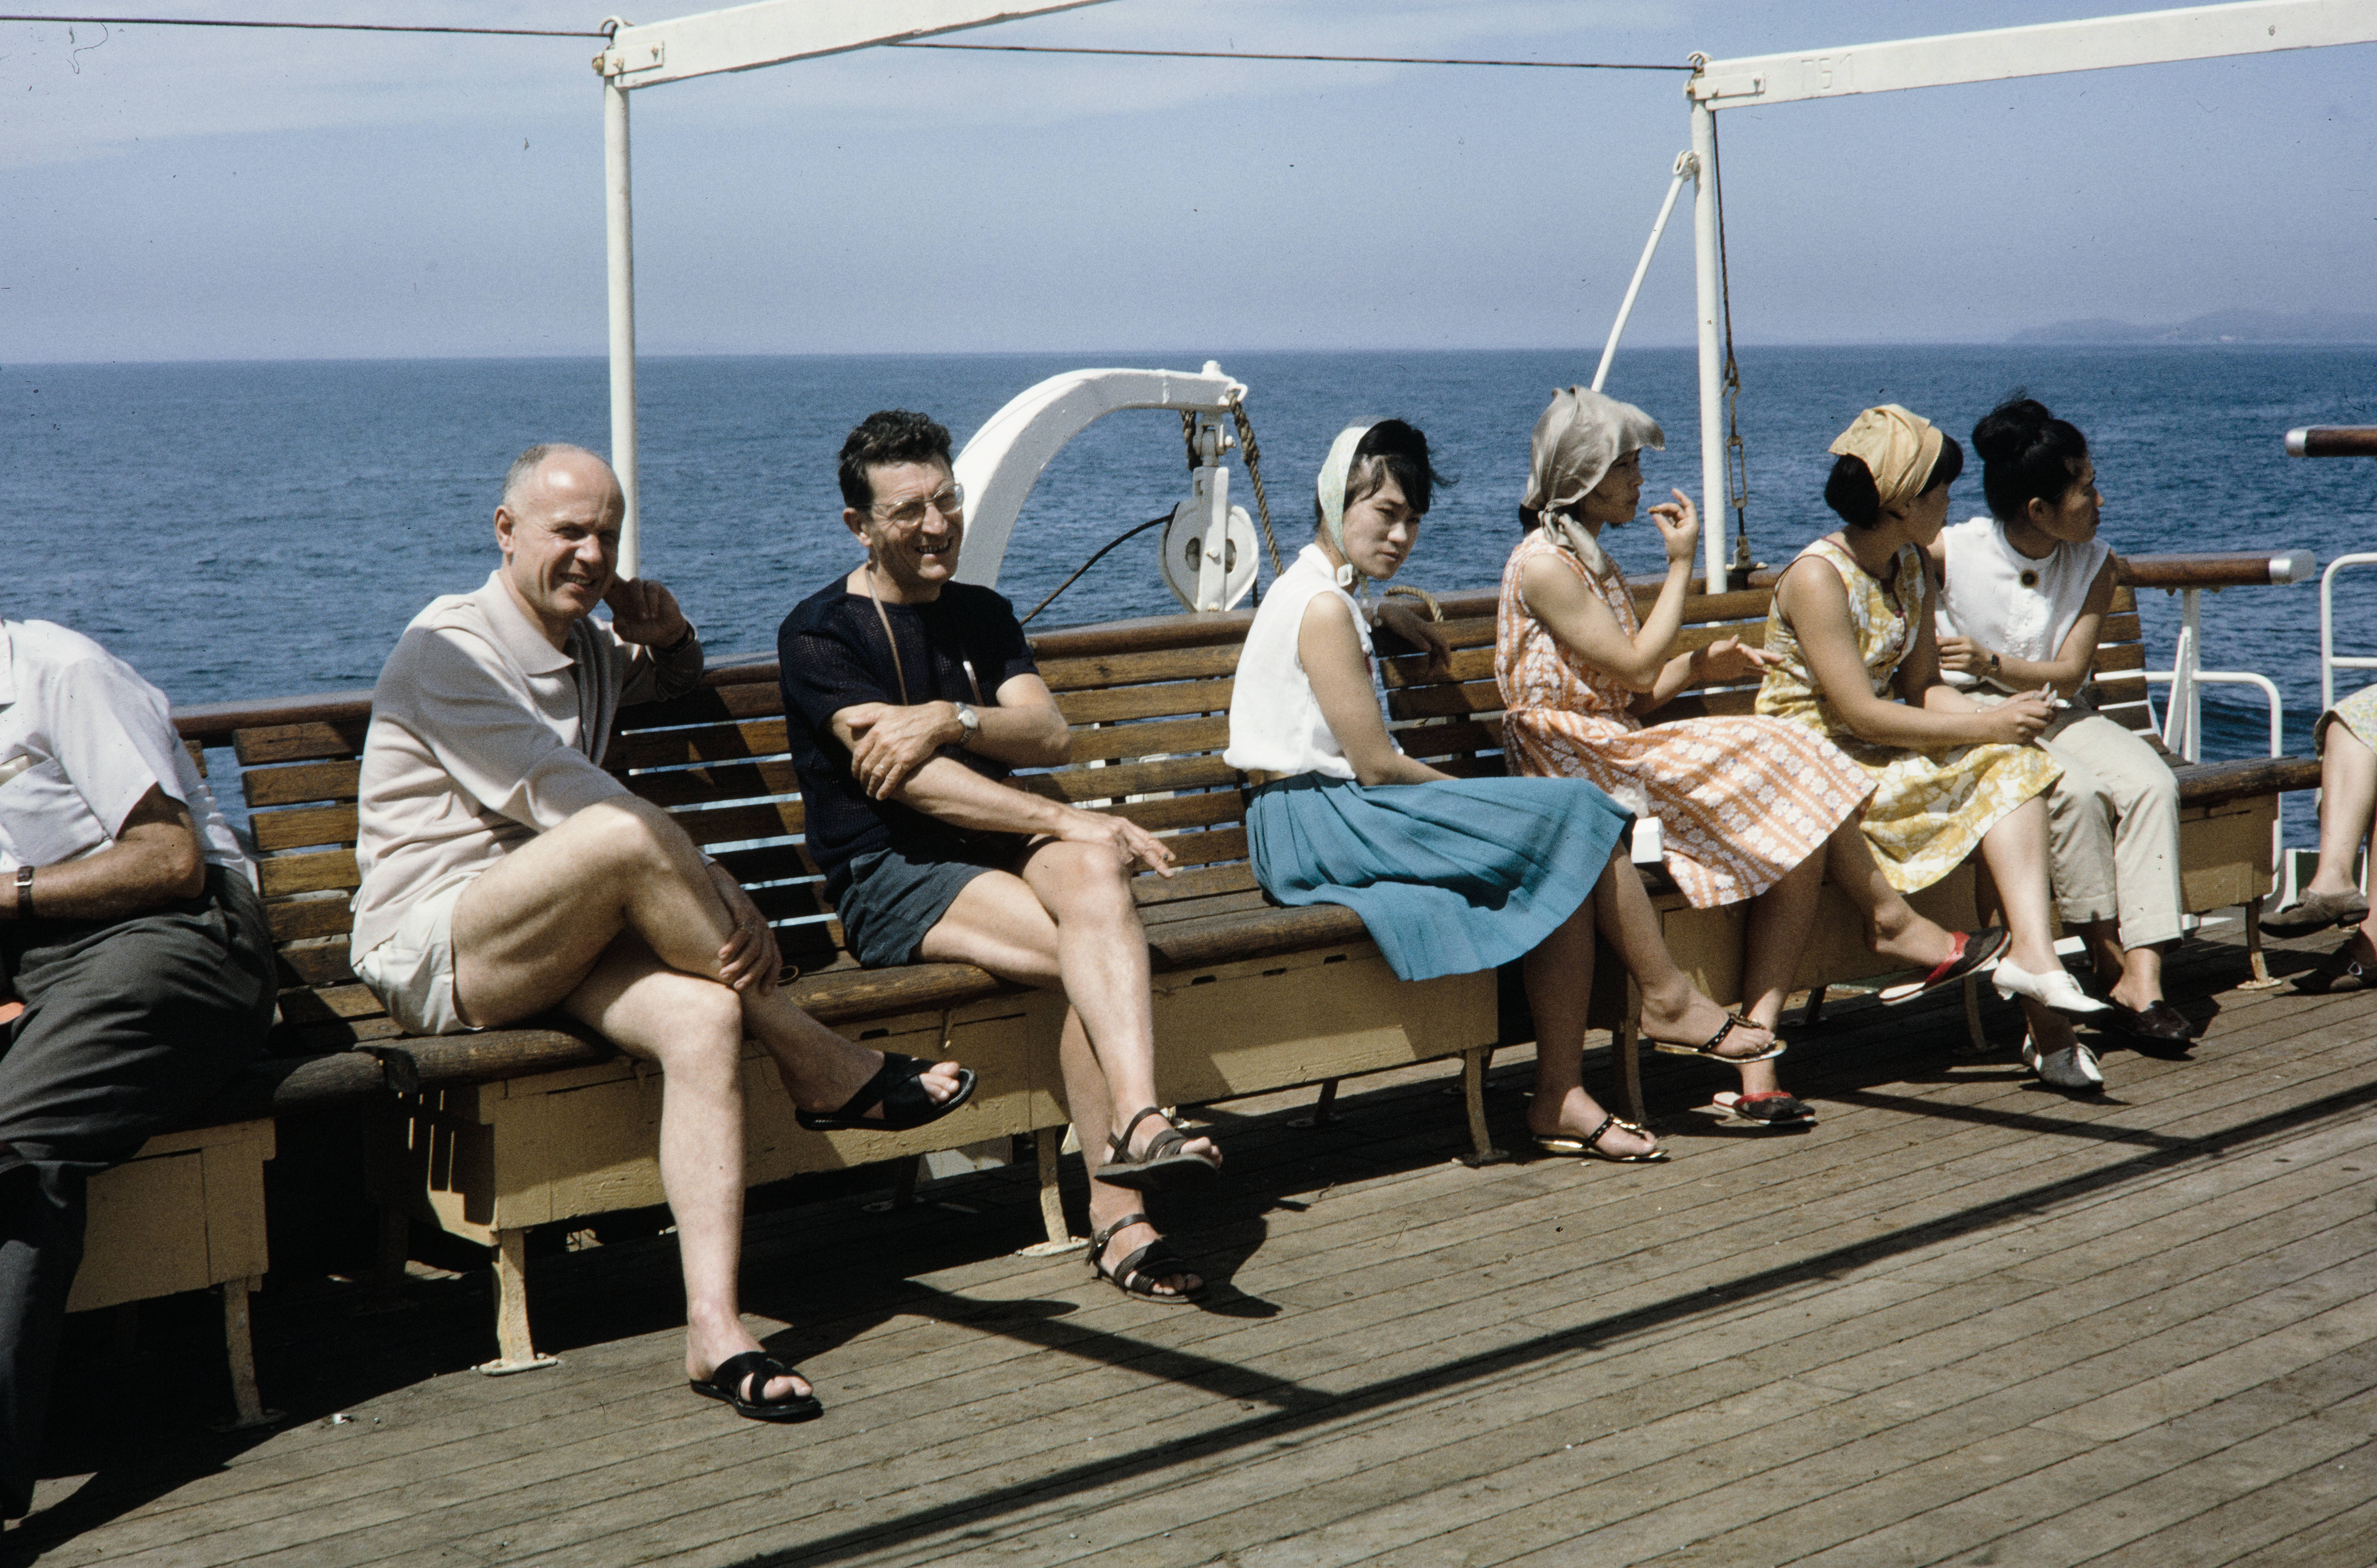 Пассажиры на верхней палубе